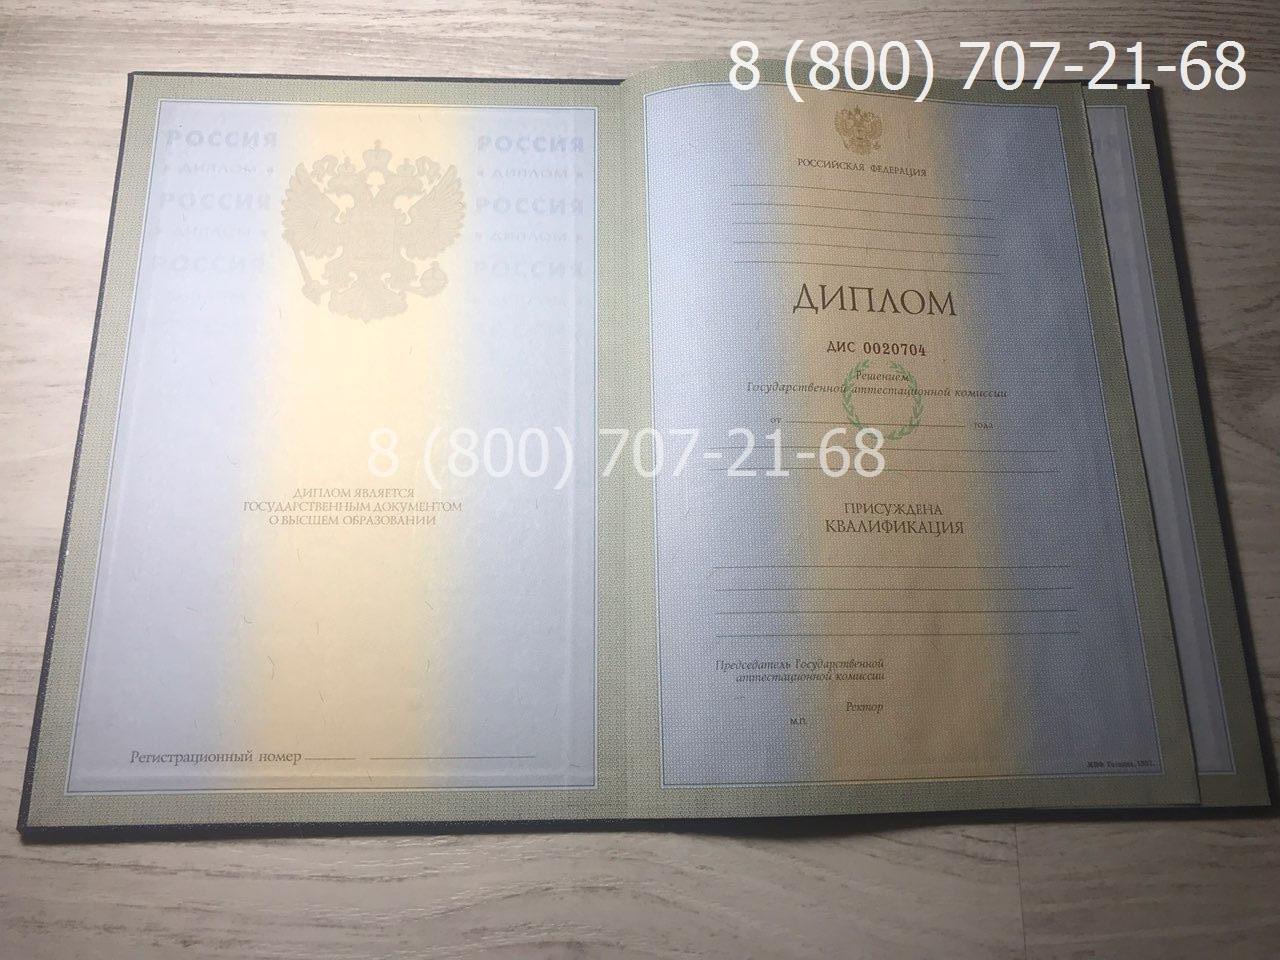 Диплом специалиста 1997-2002 фото 1